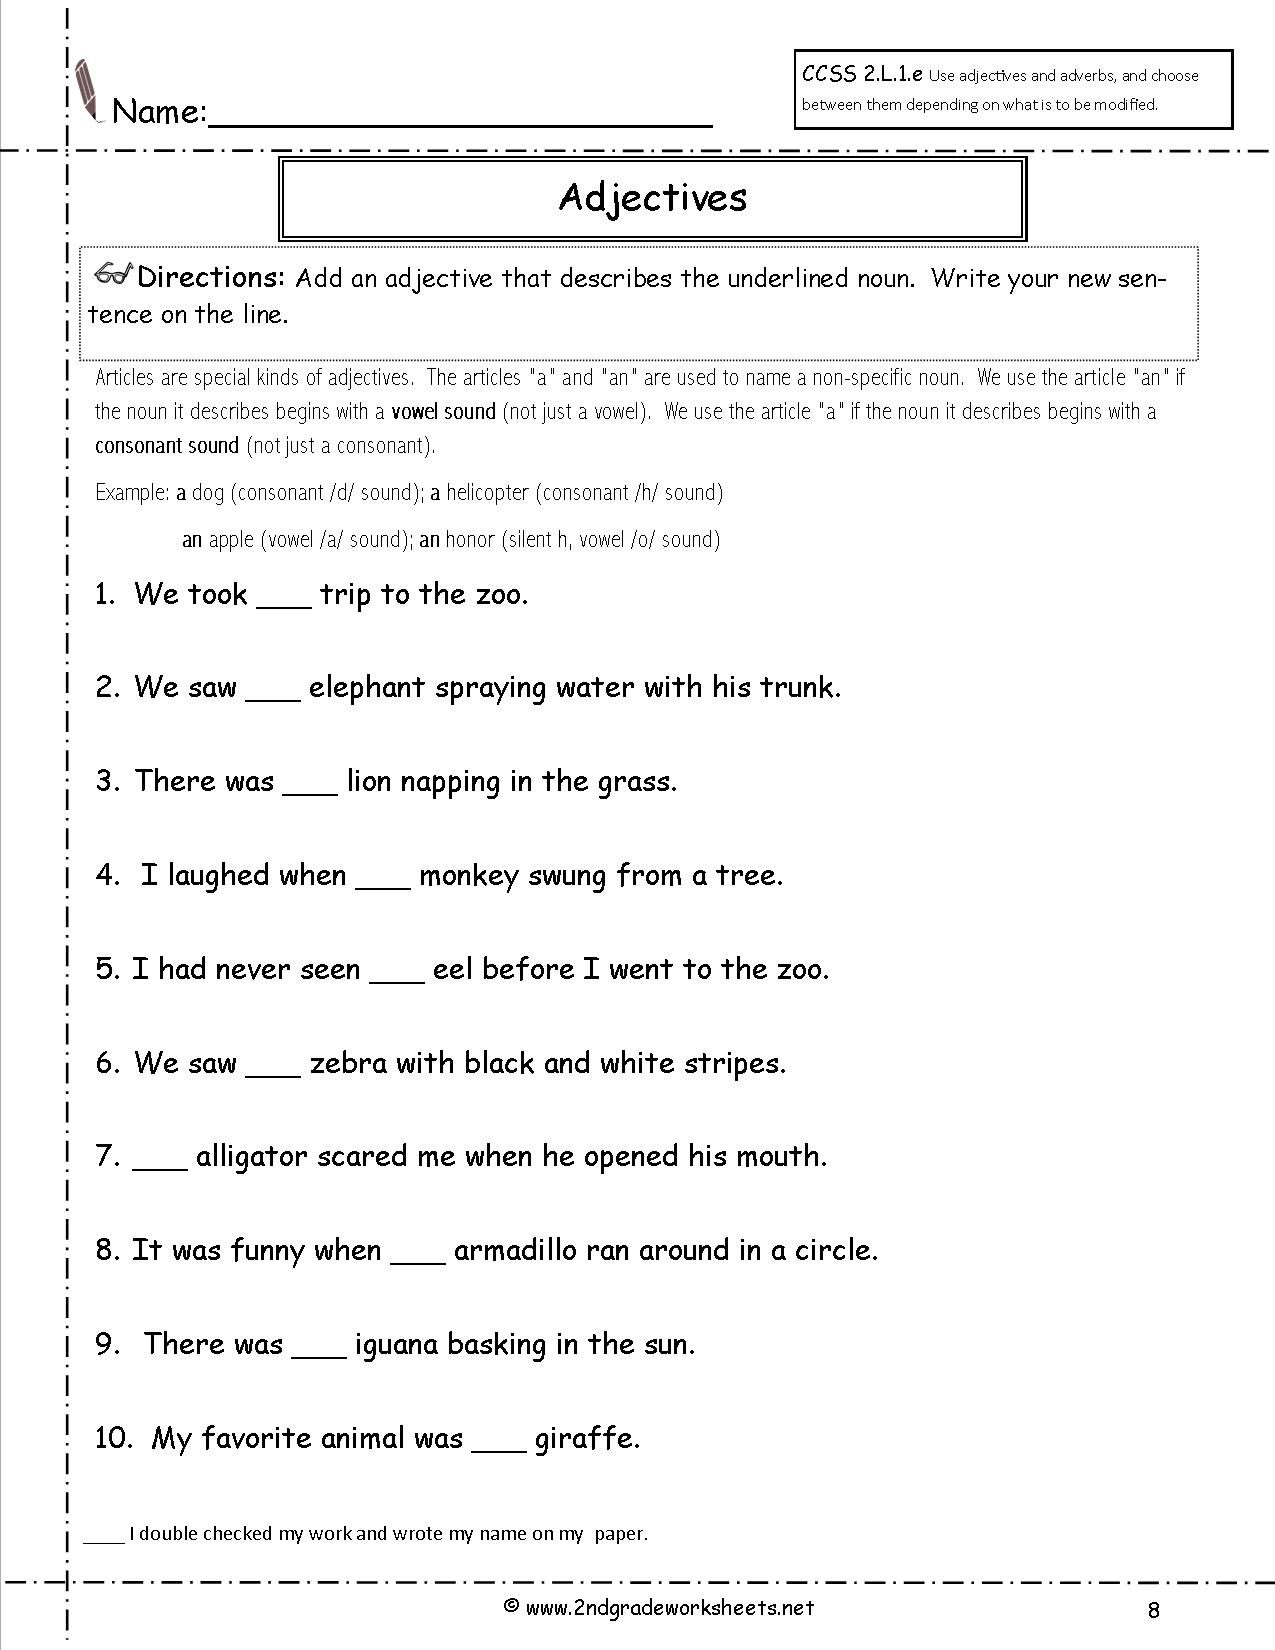 Free Language/grammar Worksheets And Printouts   Free Printable Third Grade Grammar Worksheets